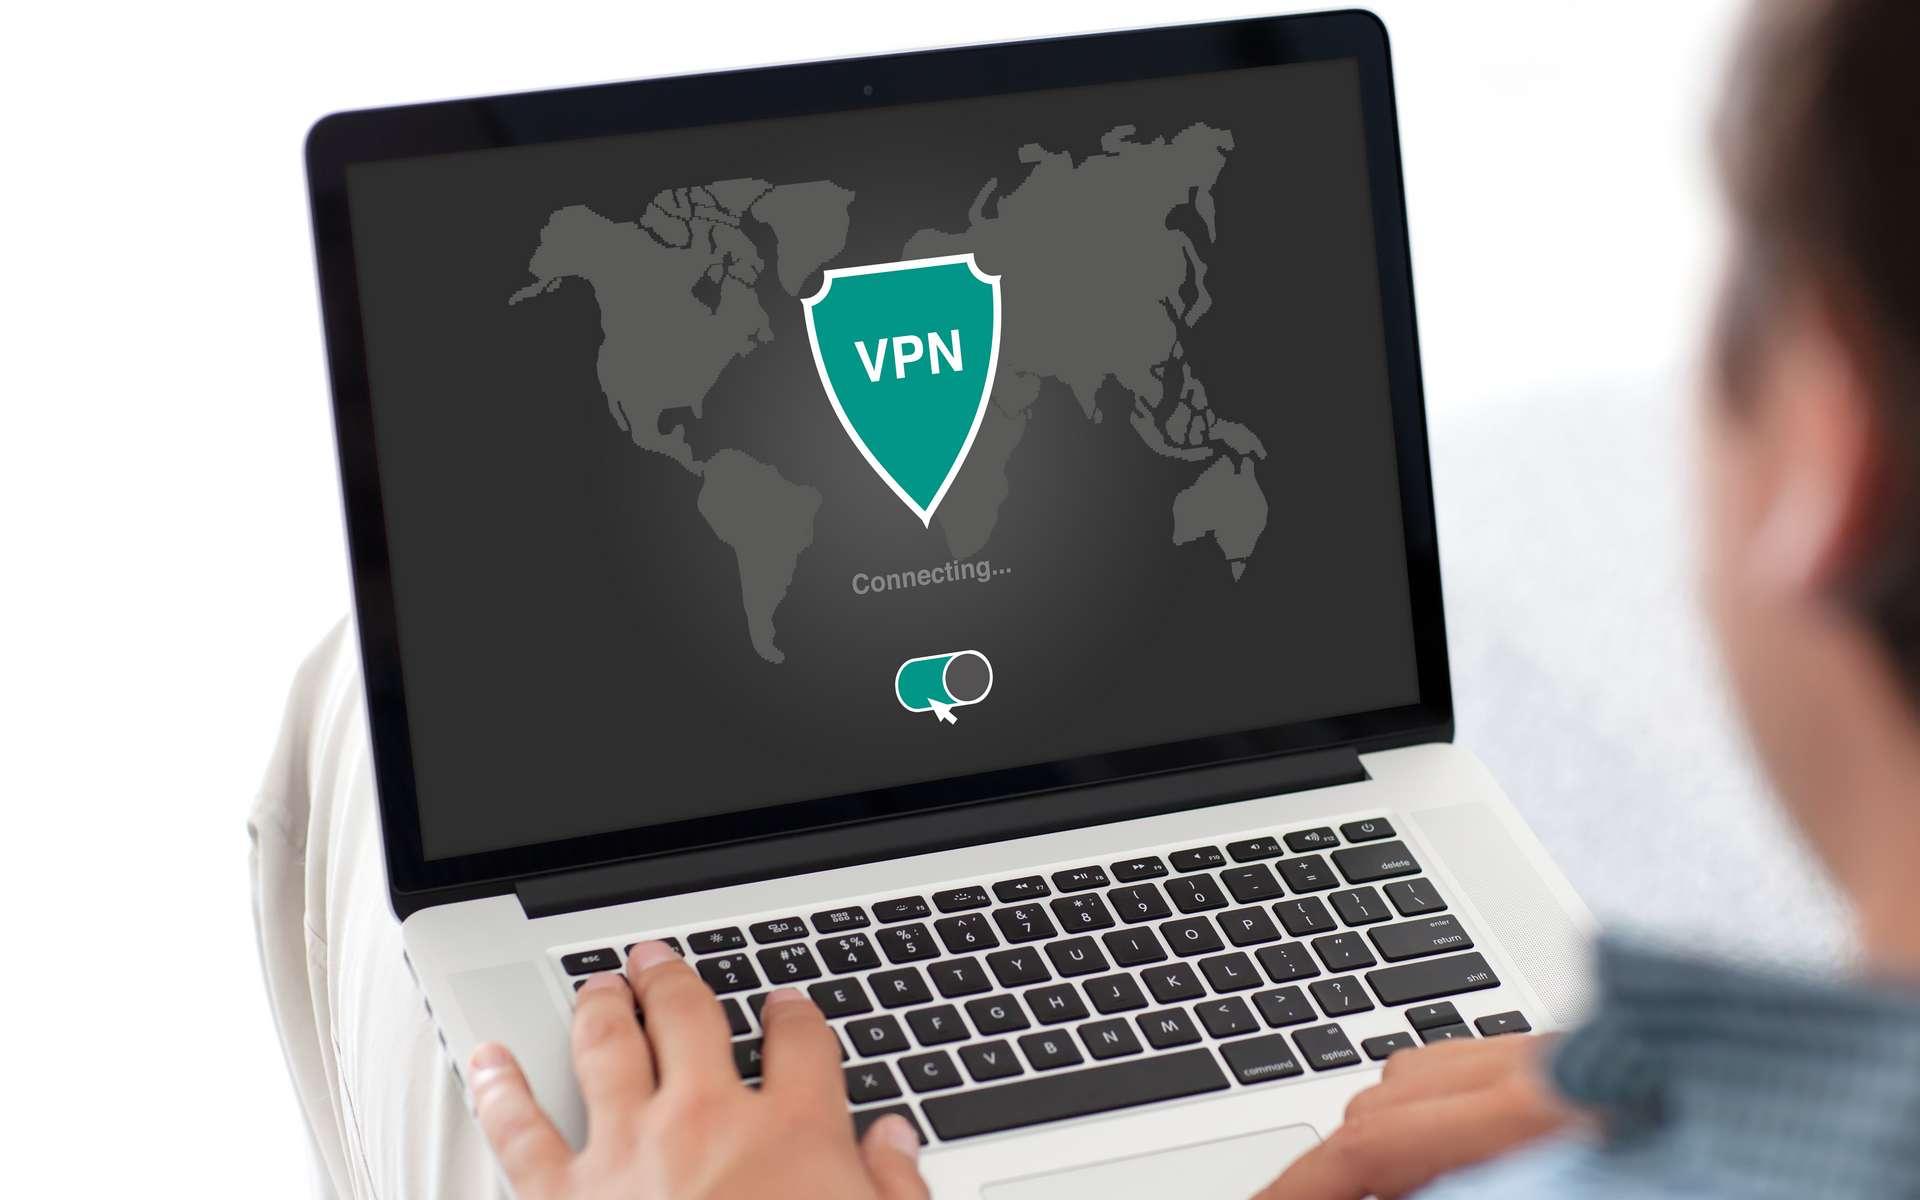 VPN pour utorrent : comment rester anonyme ? © Denys Prykhodov, Adobe Stock